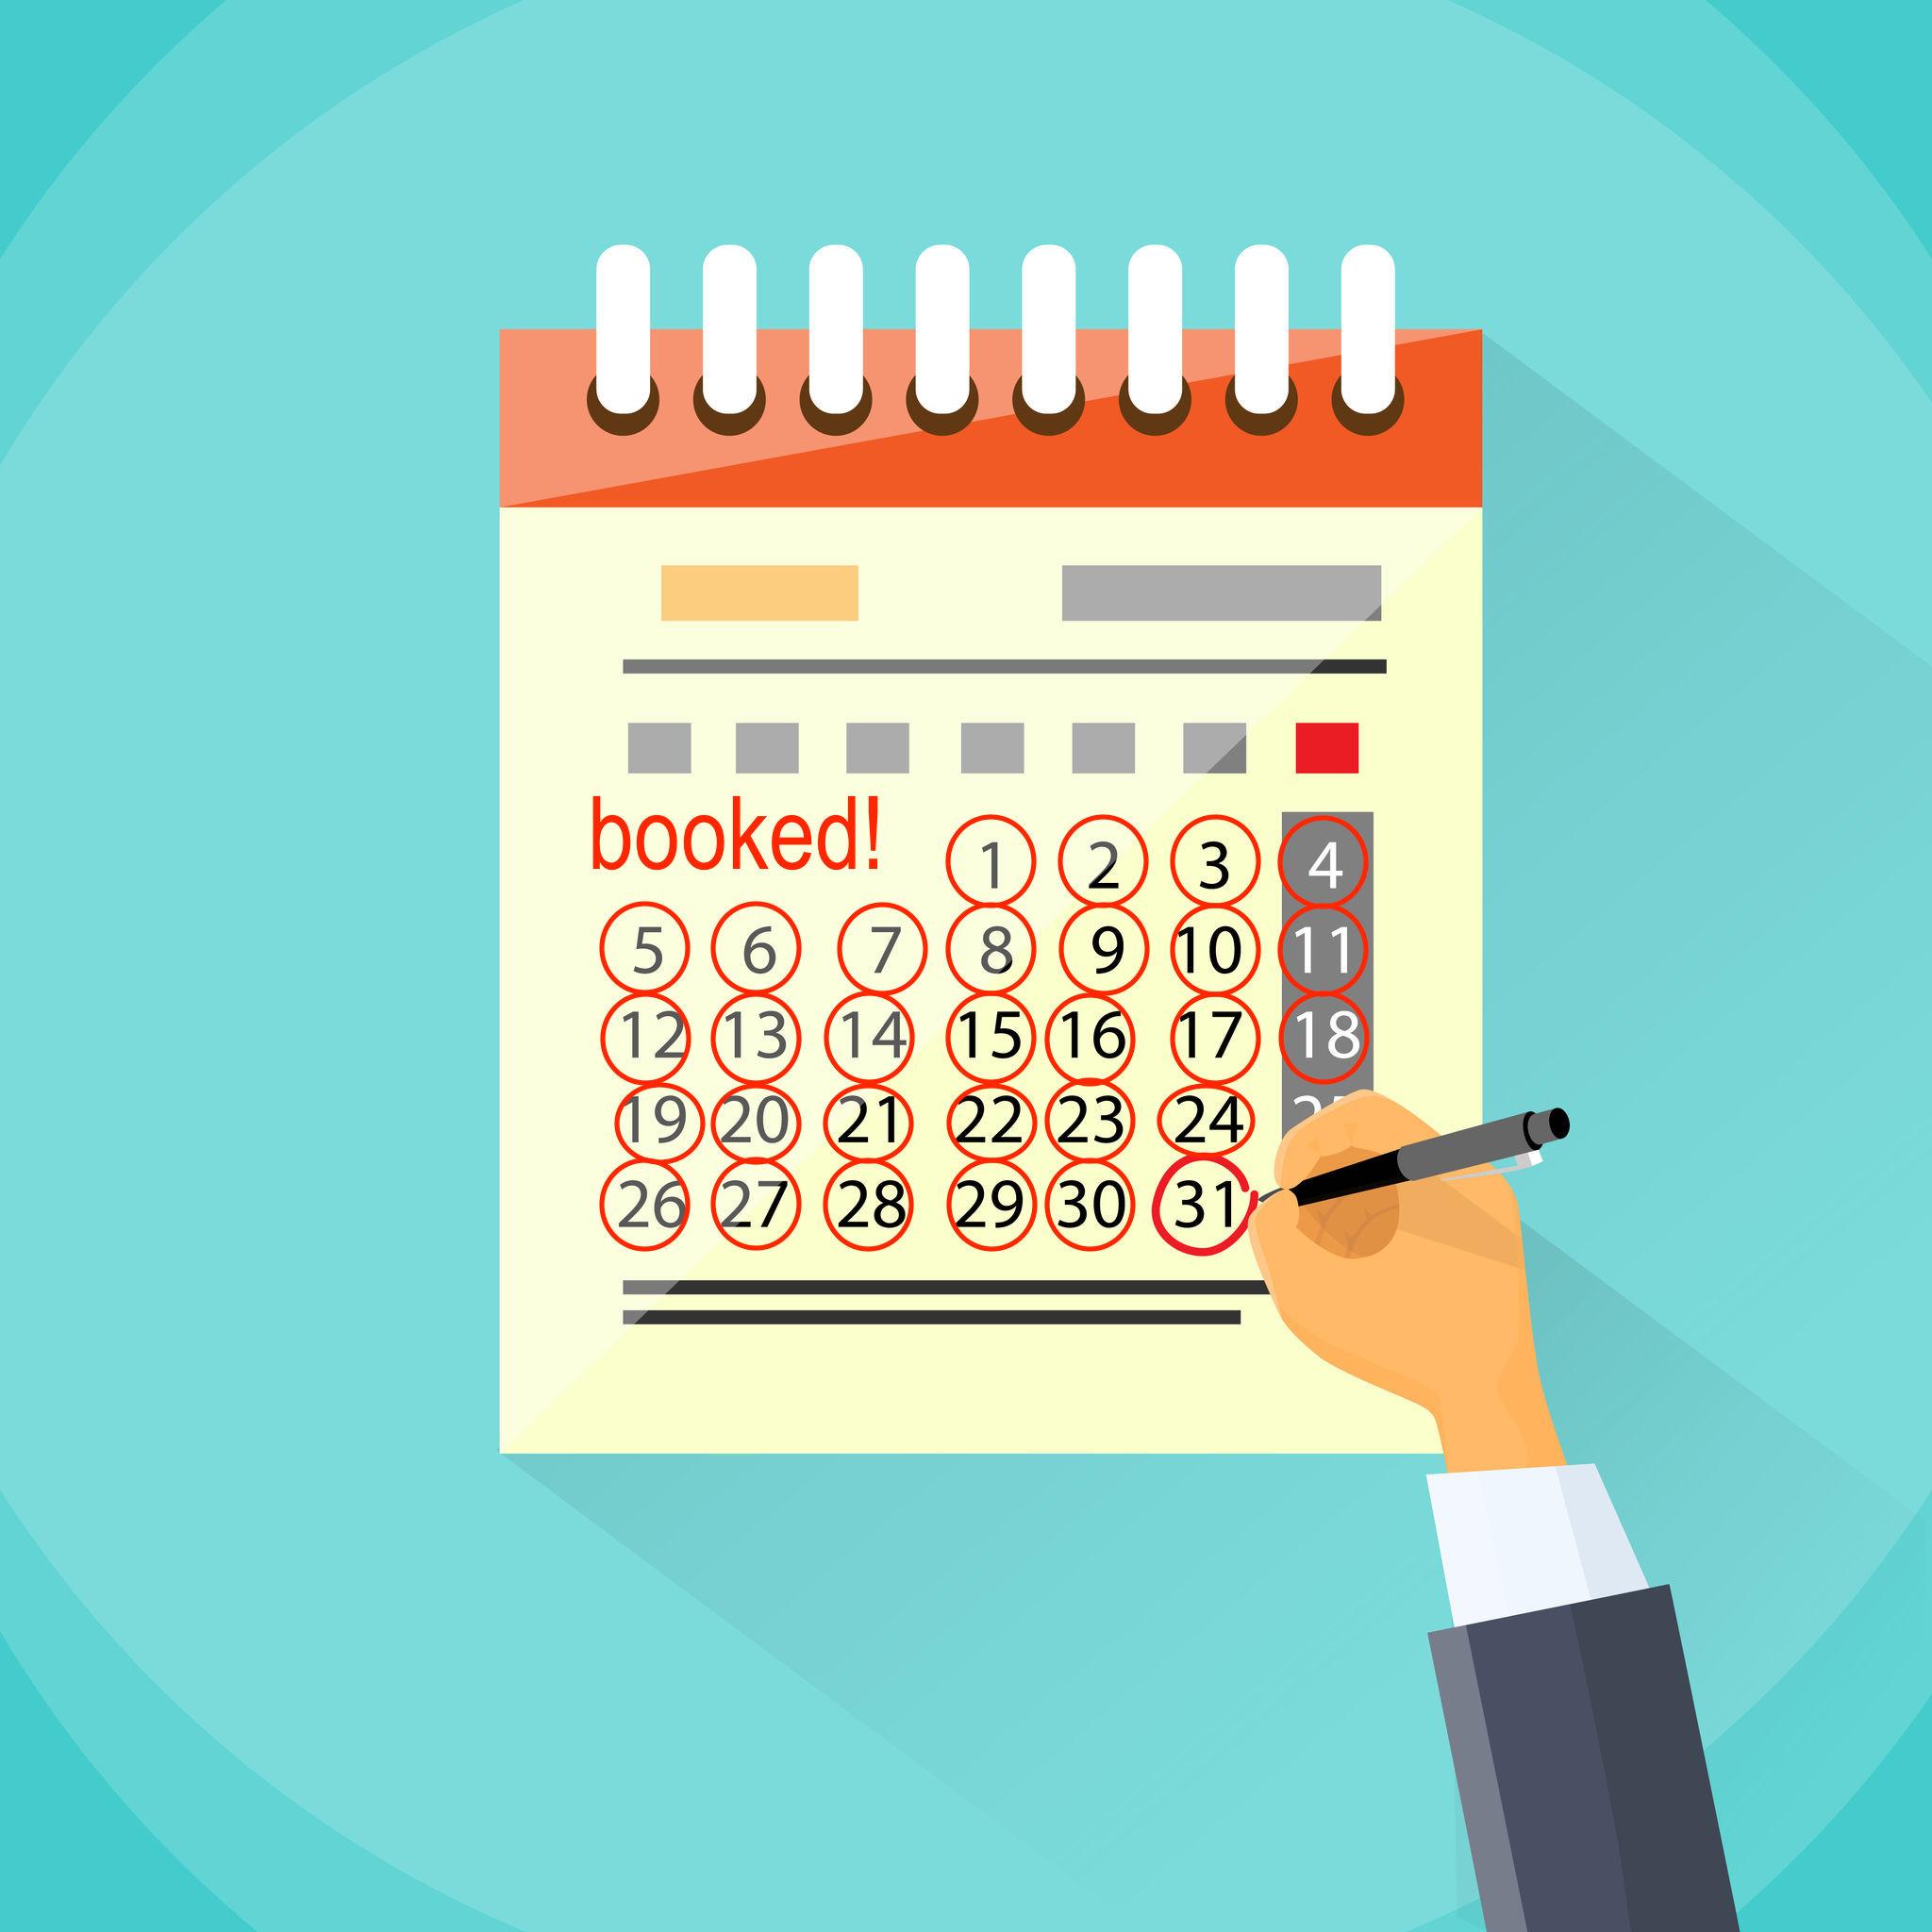 Booked Vacation Rental Calendar